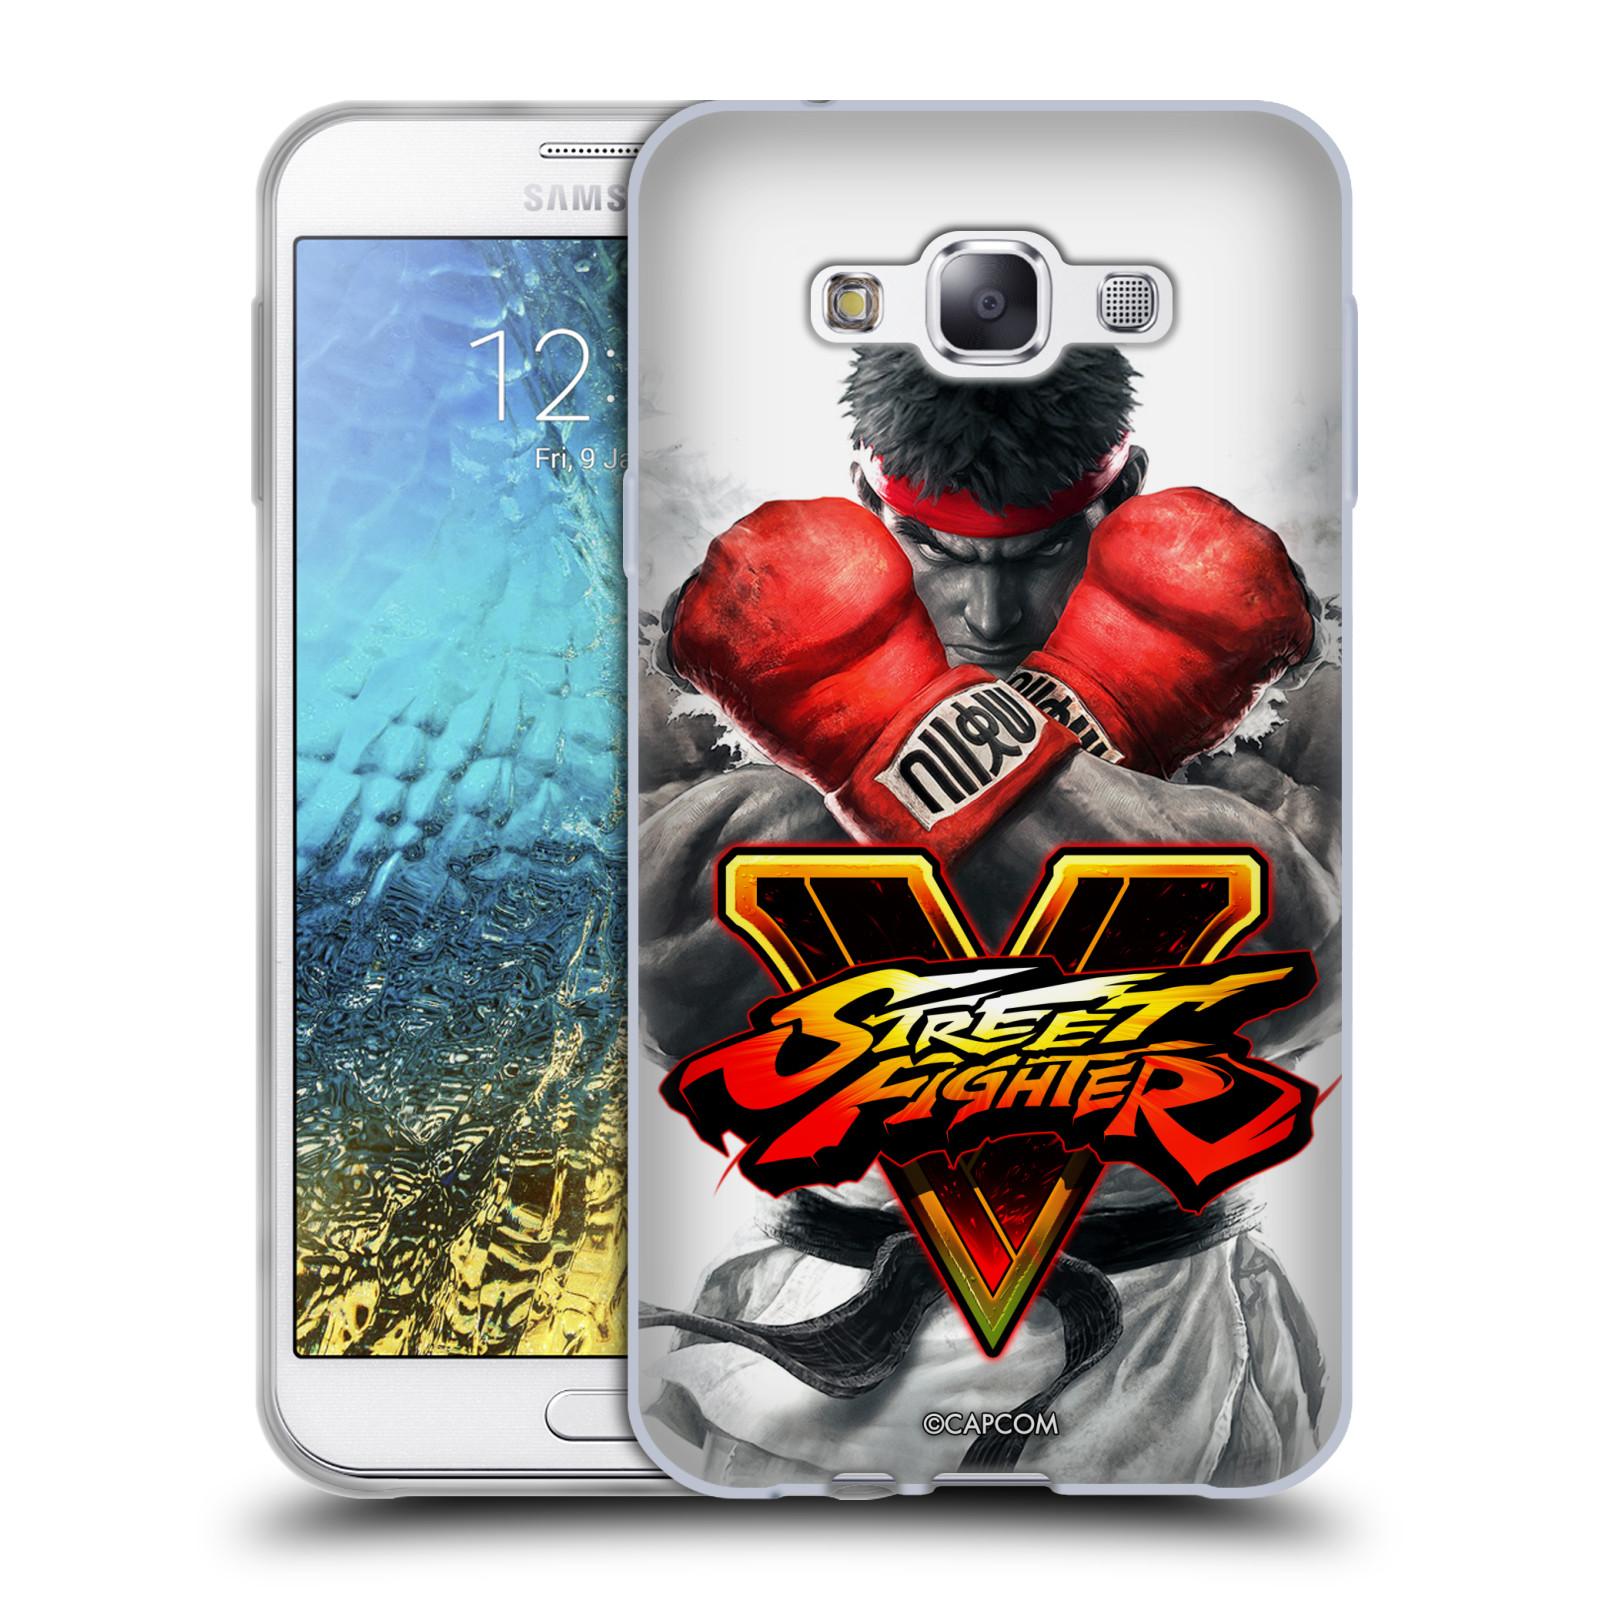 HEAD CASE silikonový obal na mobil Samsung Galaxy E7 oficiální kryt STREET FIGHTER Boxer Ryu